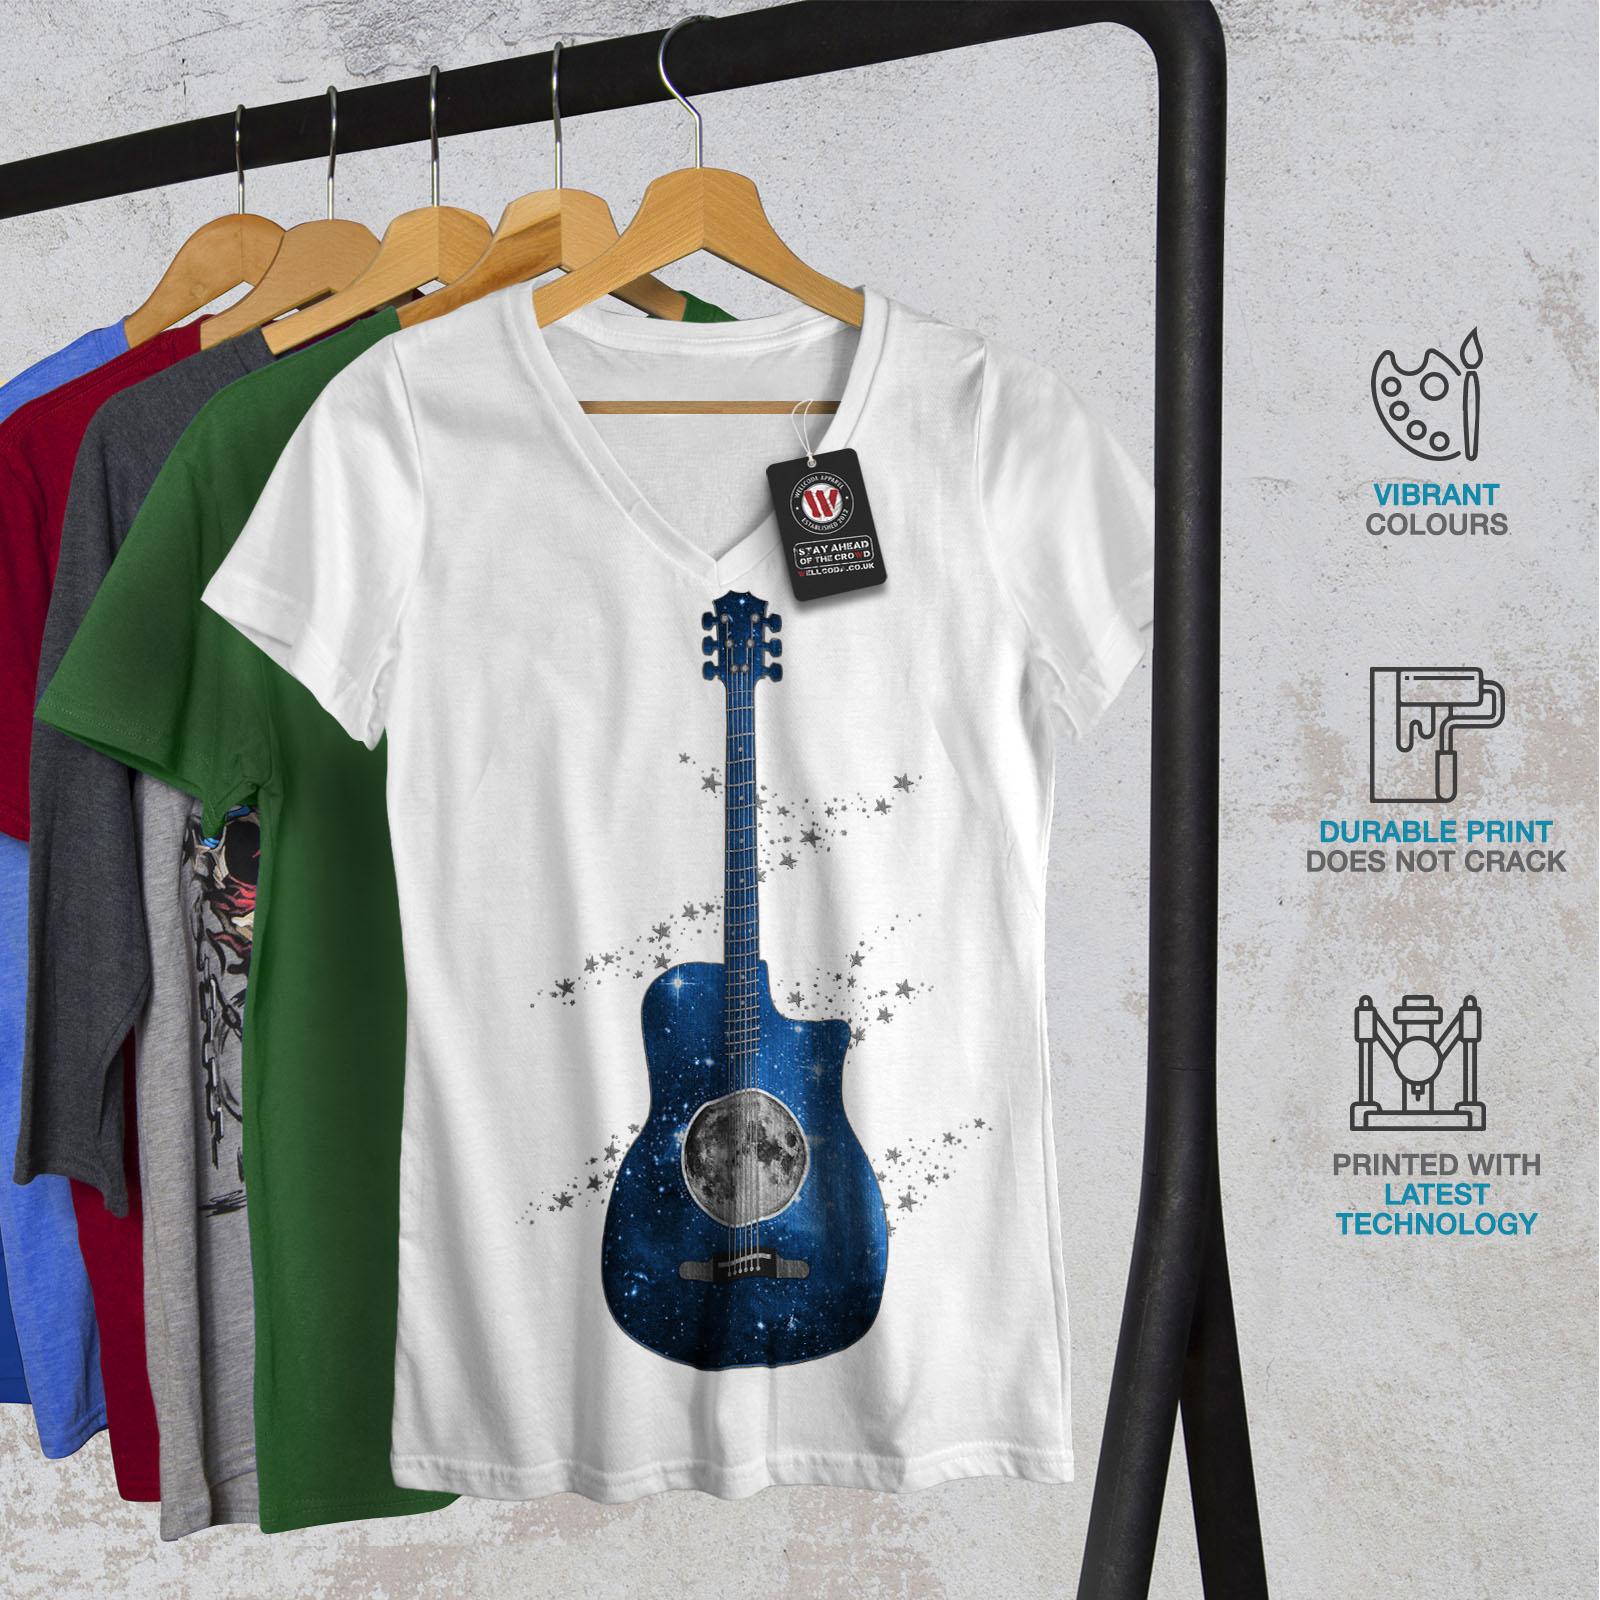 Wellcoda-Guitar-Planet-Earth-Womens-V-Neck-T-shirt-Rock-Graphic-Design-Tee thumbnail 8